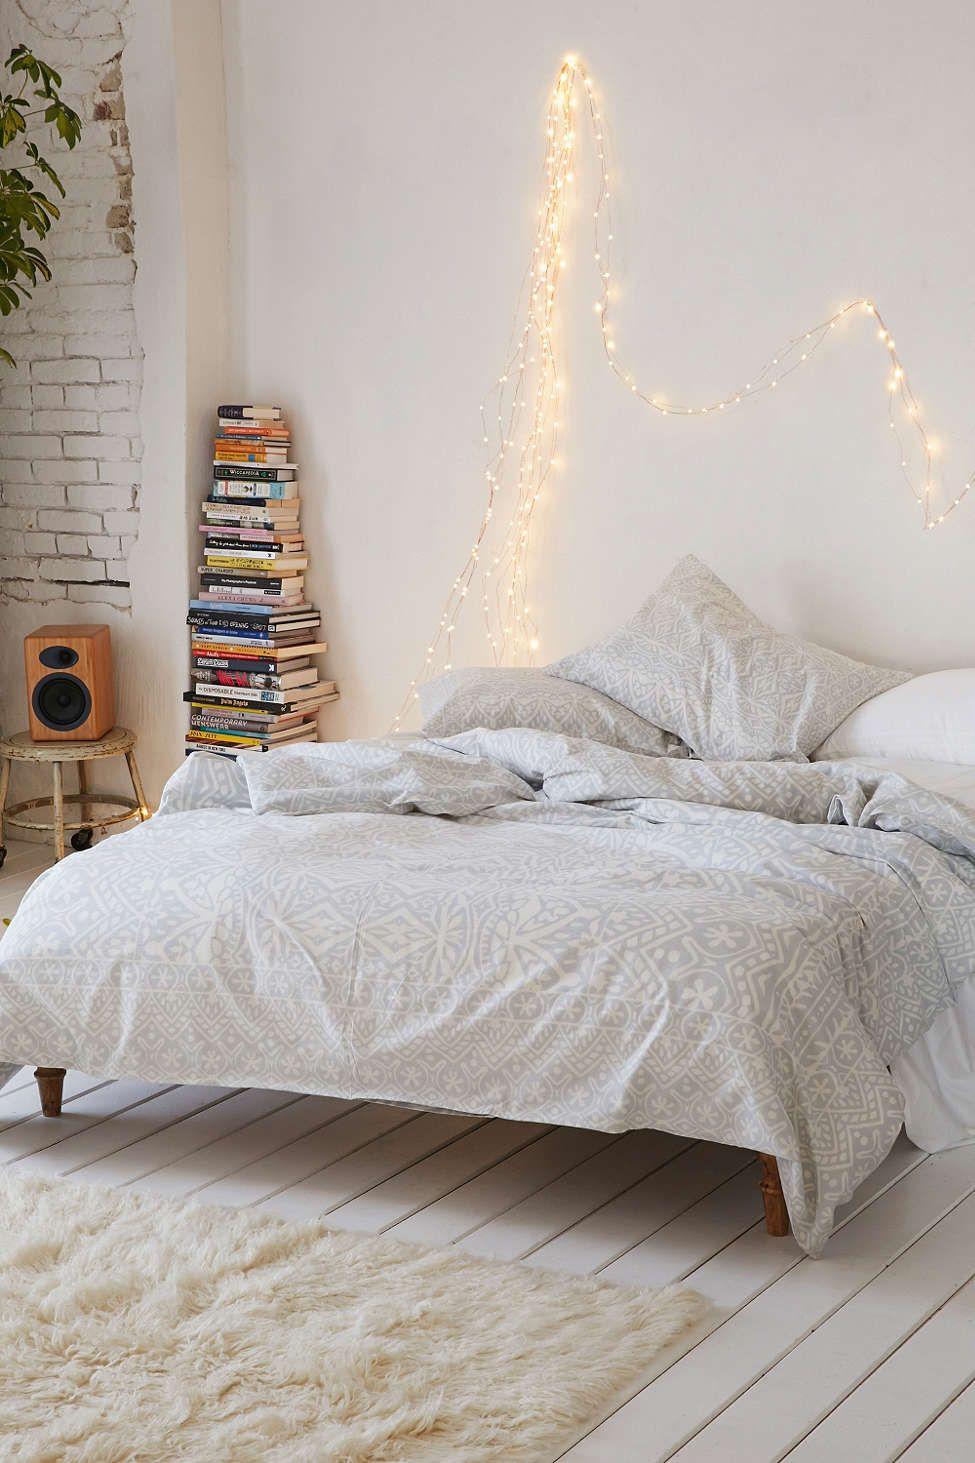 31 Bohemian Bedroom Decor Bedroom decor, Bedroom styles